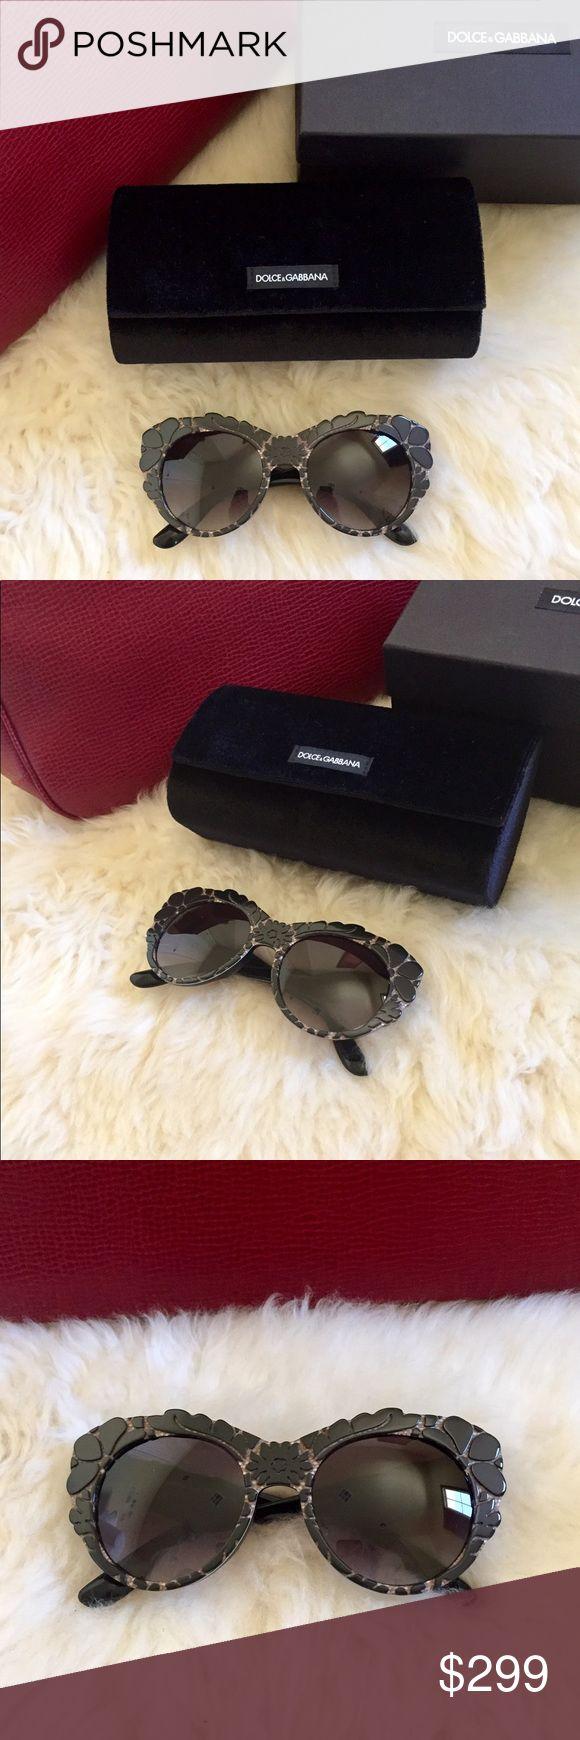 bb1eb892fb0 Dolce   Gabbana DNA Oversized Sunglasses New In Box- Women s DNA oversized  sunglasses with textured